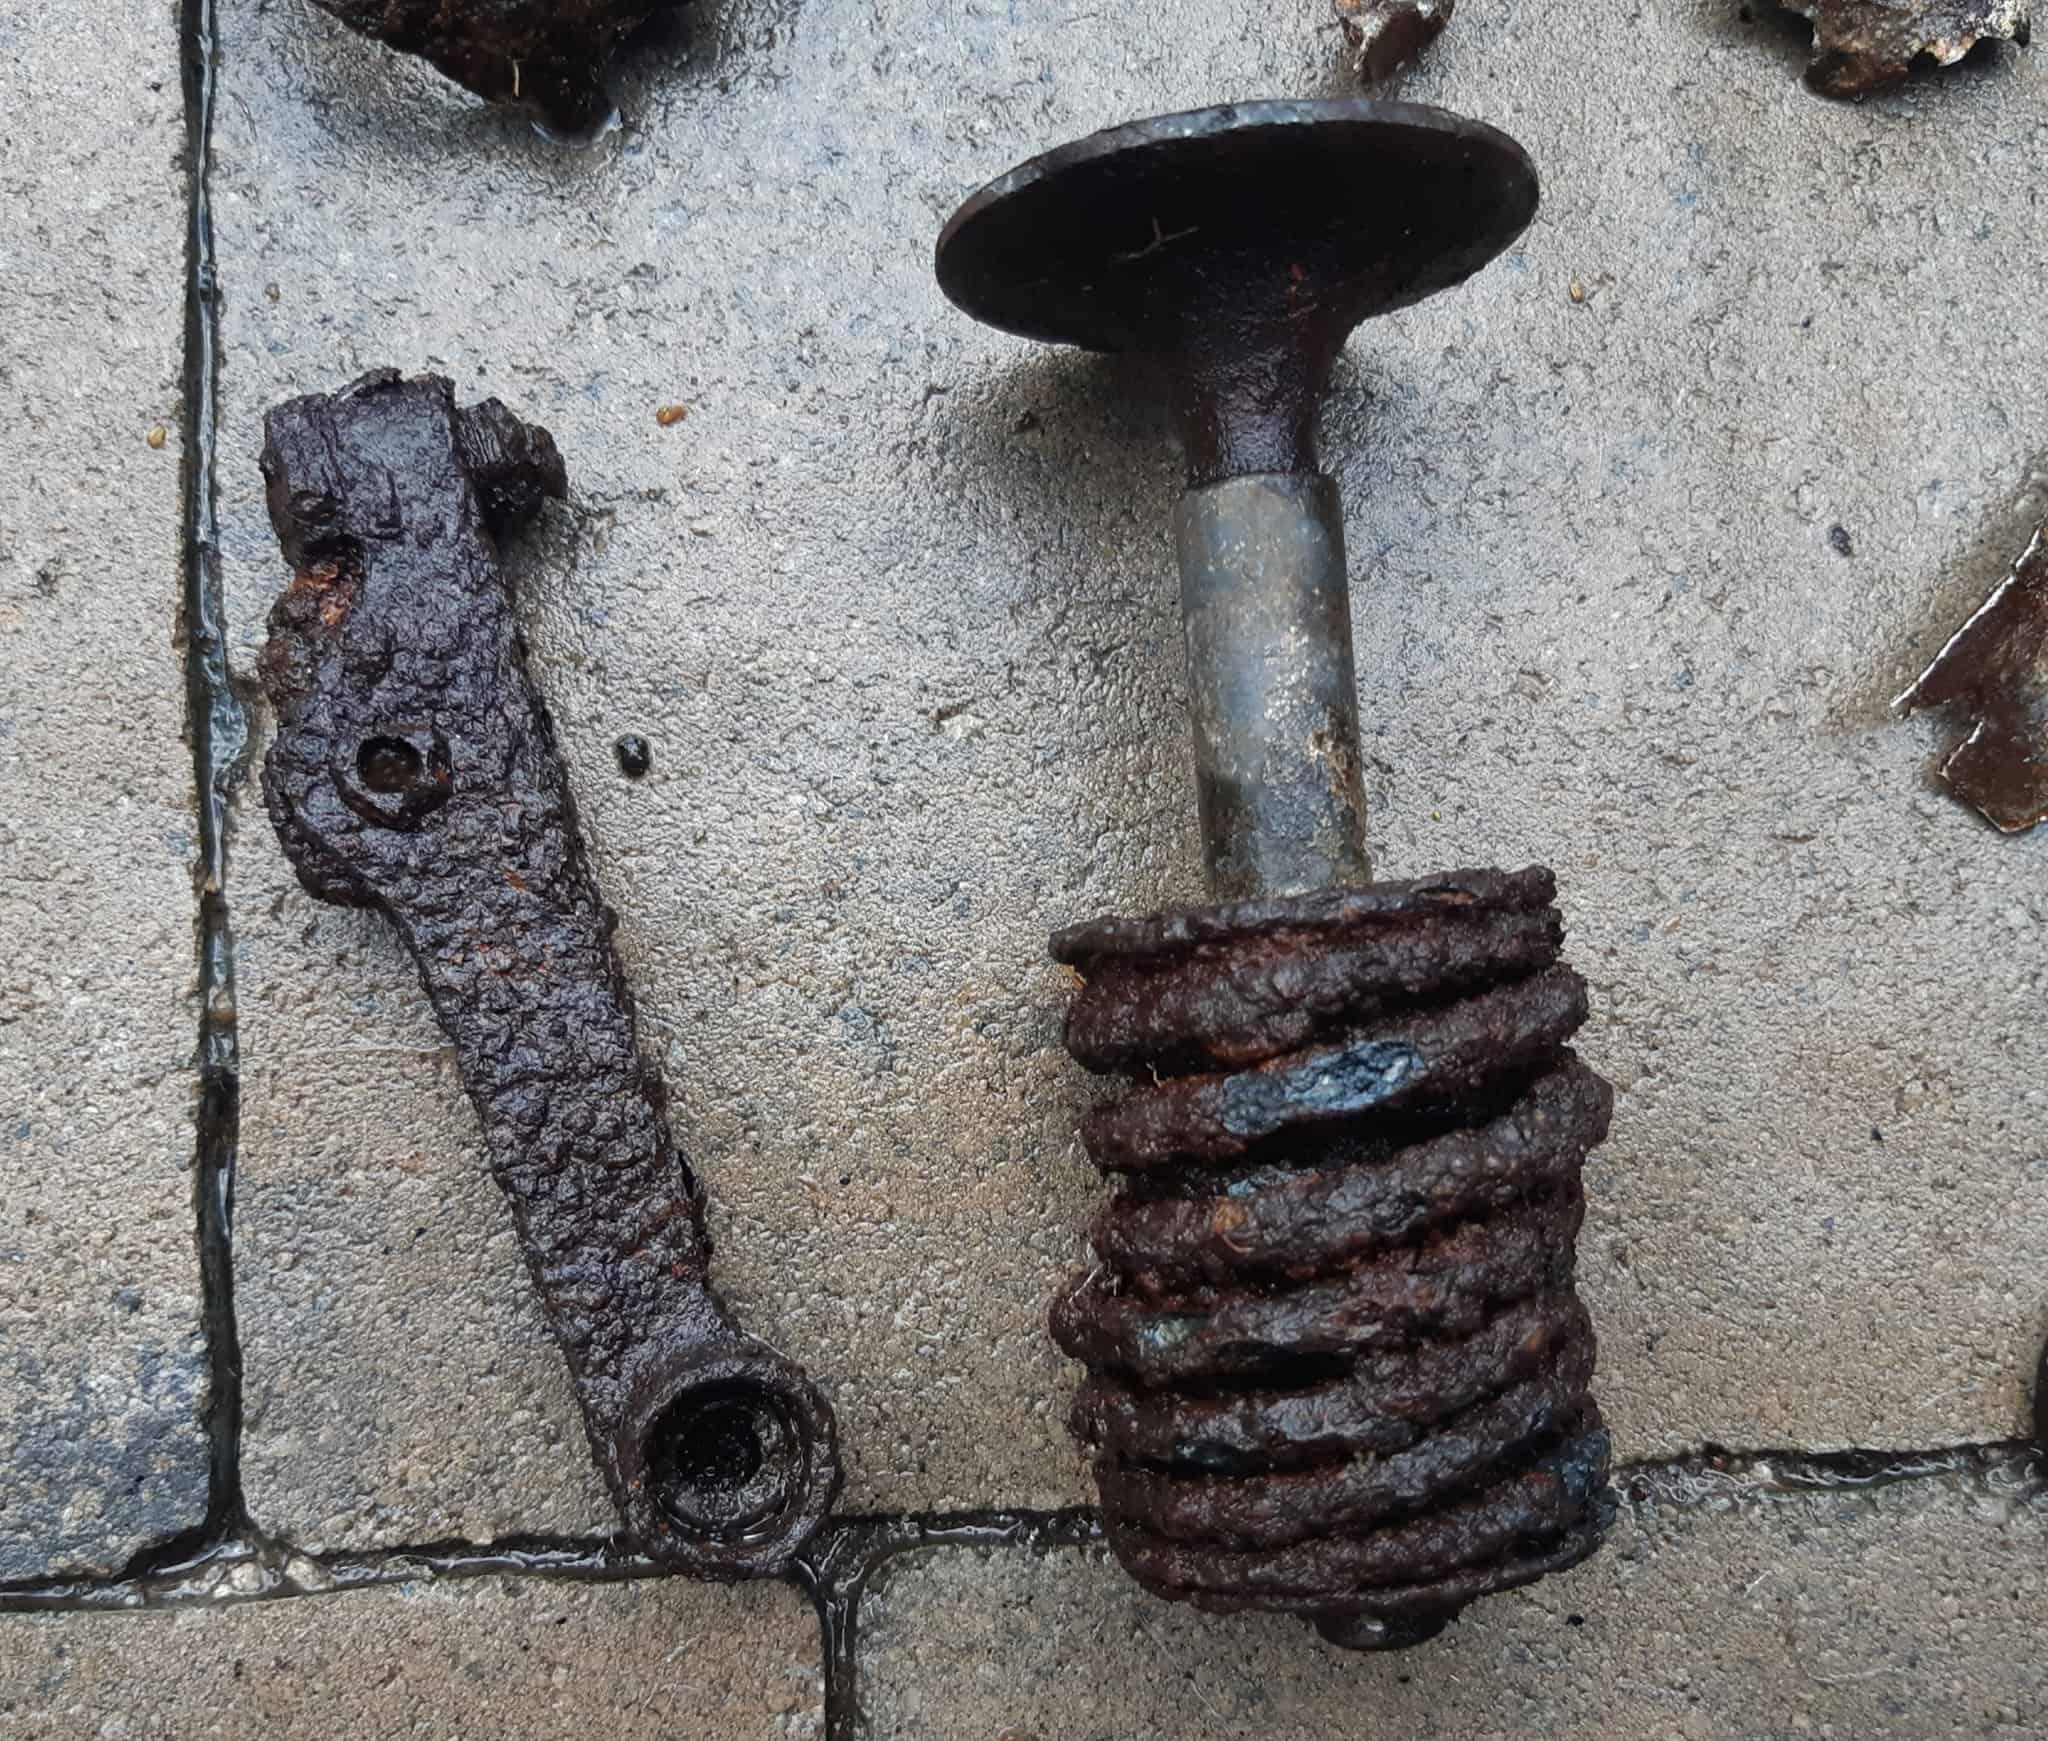 клапан від двигуна Jumo 211 (були на Юнкерс 88 та Хейнкель 111)